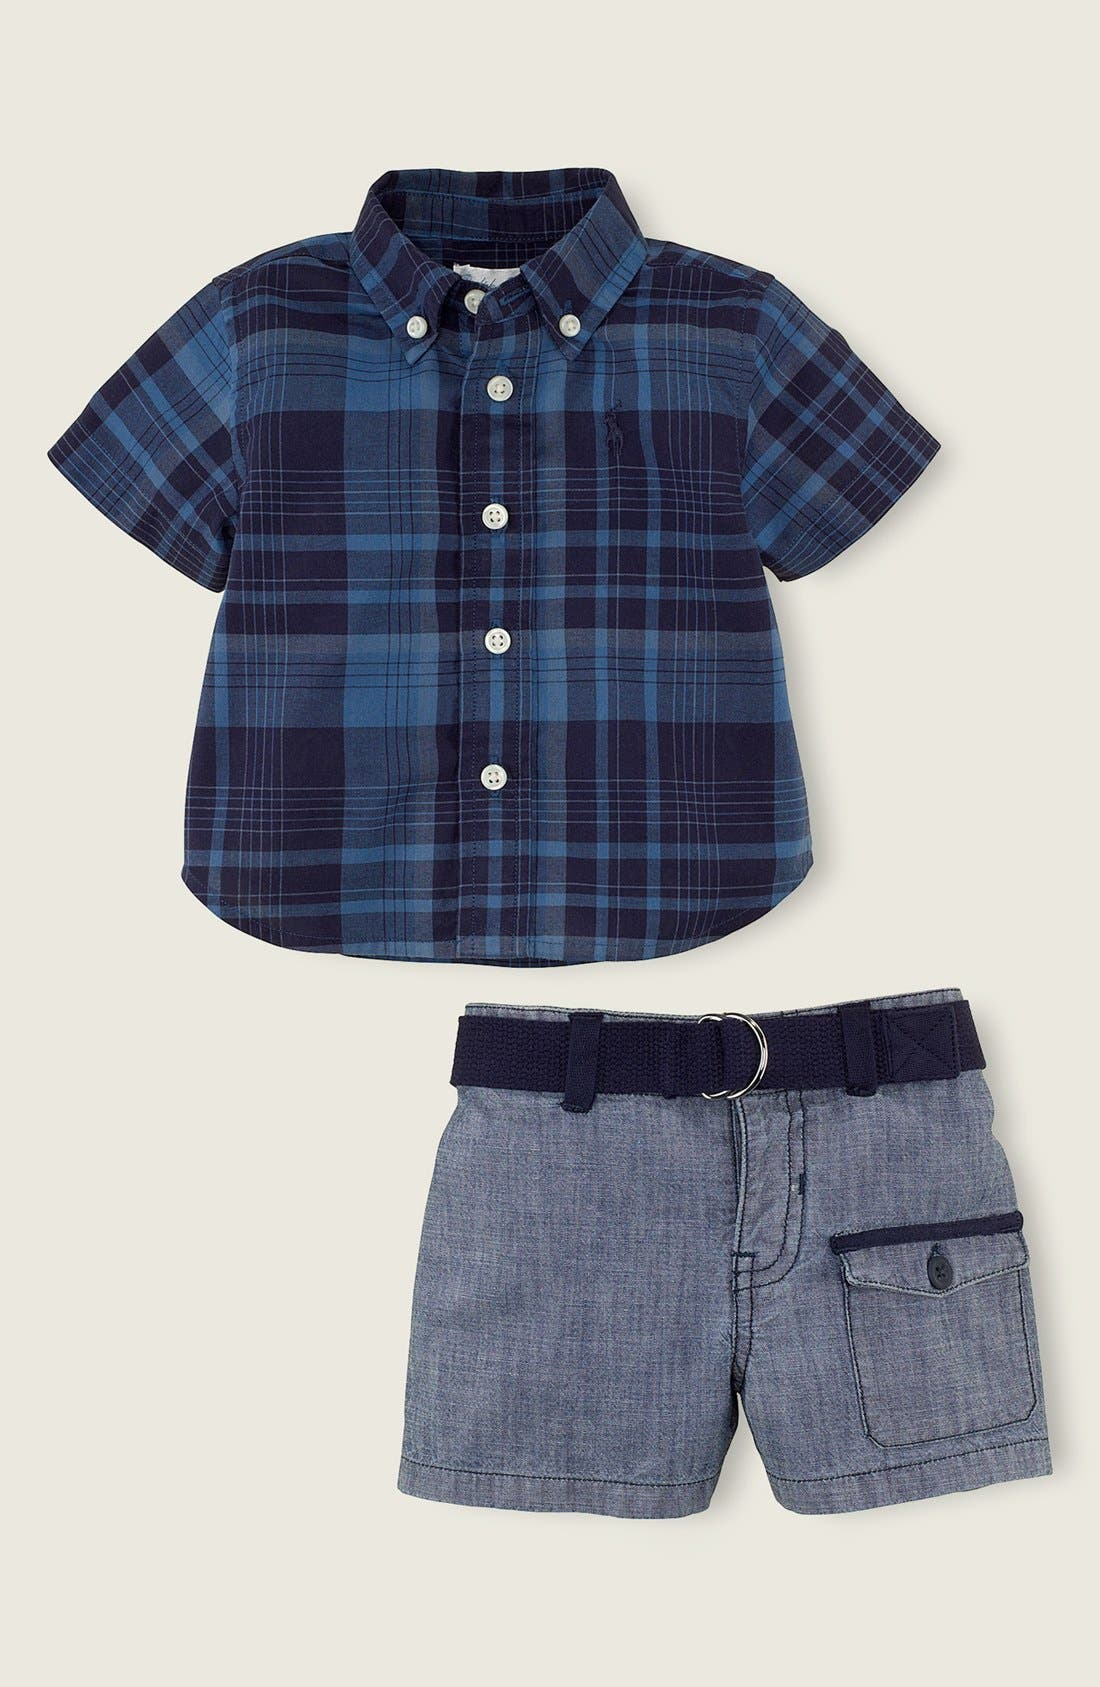 Alternate Image 1 Selected - Ralph Lauren Plaid Shirt & Shorts (Baby Boys)